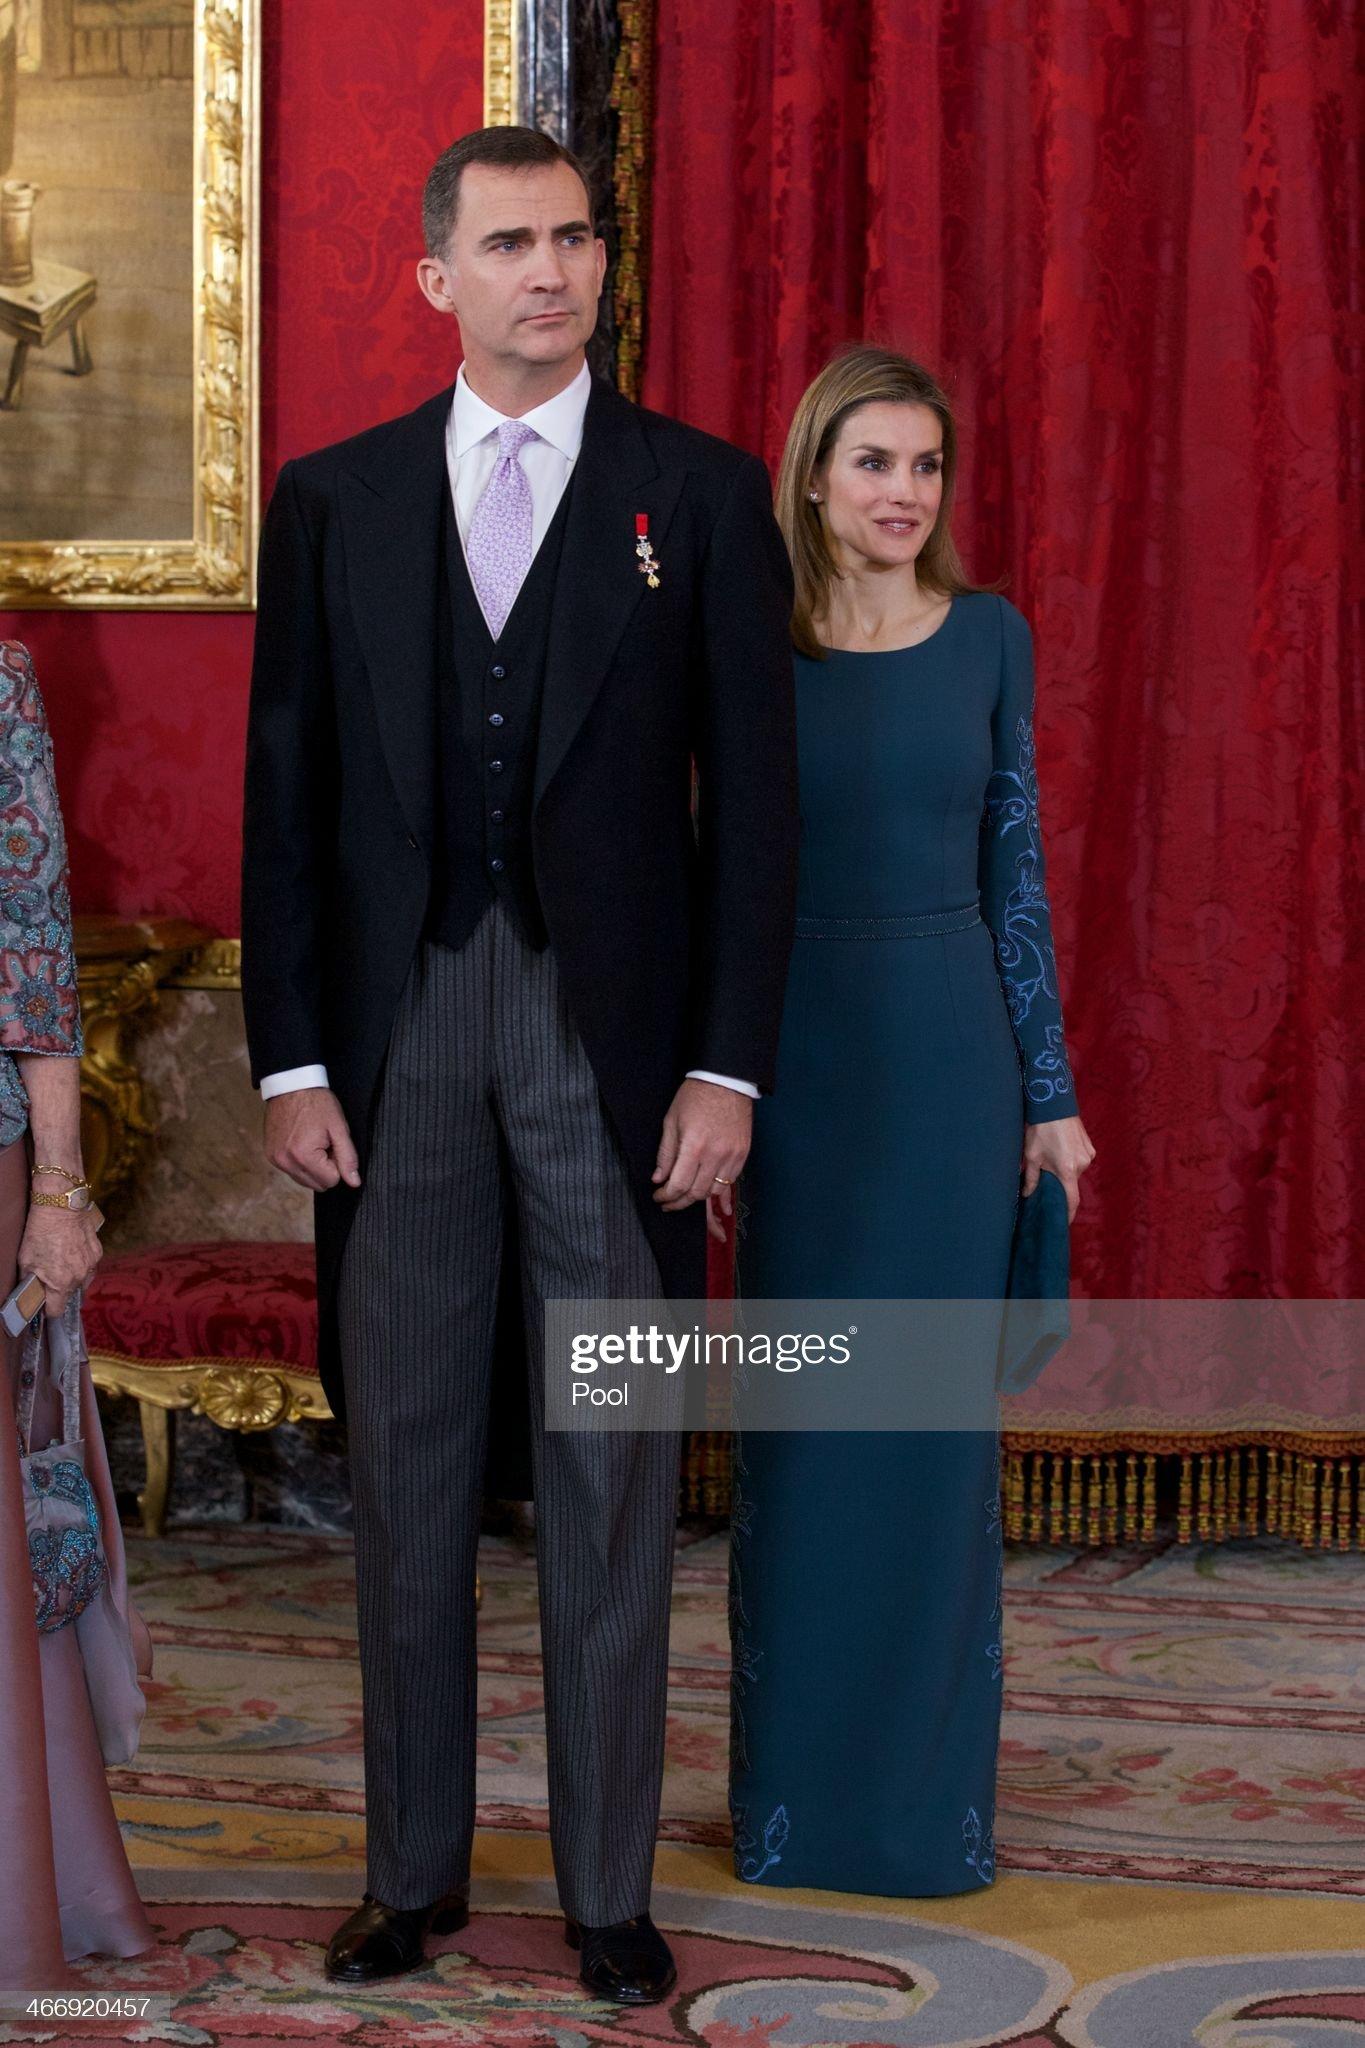 Вечерние наряды Королевы Летиции Spanish Royals Receive Diplomatic Corps in Madrid : News Photo